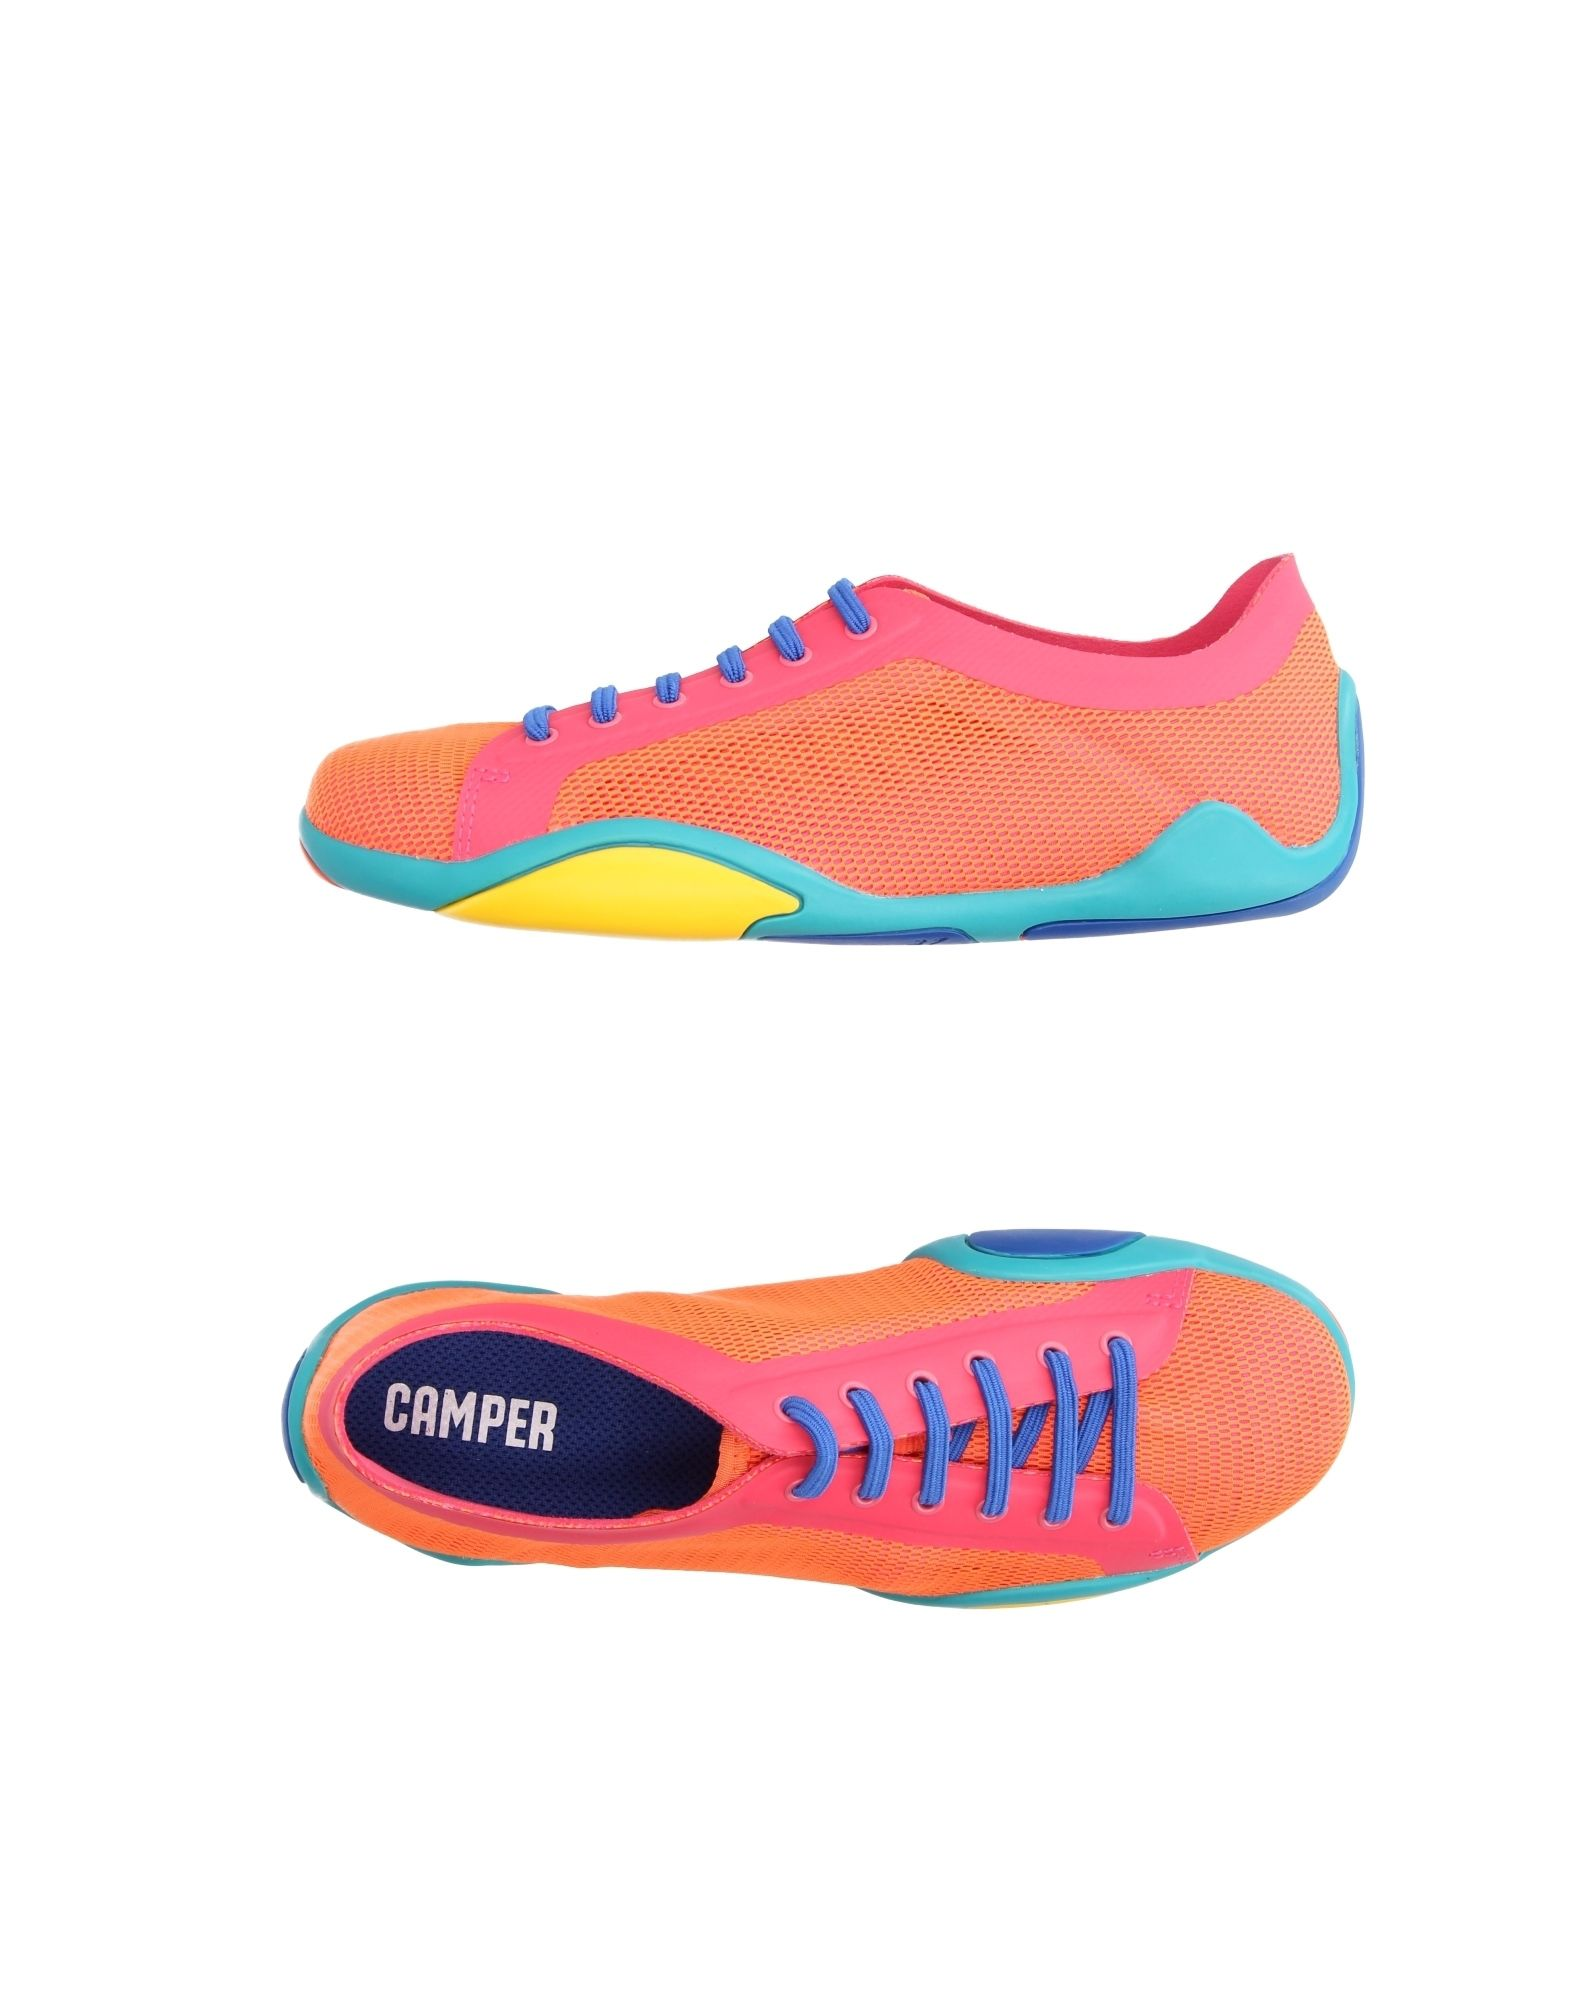 Camper Sneakers Damen  11211287EE Gute Qualität beliebte Schuhe